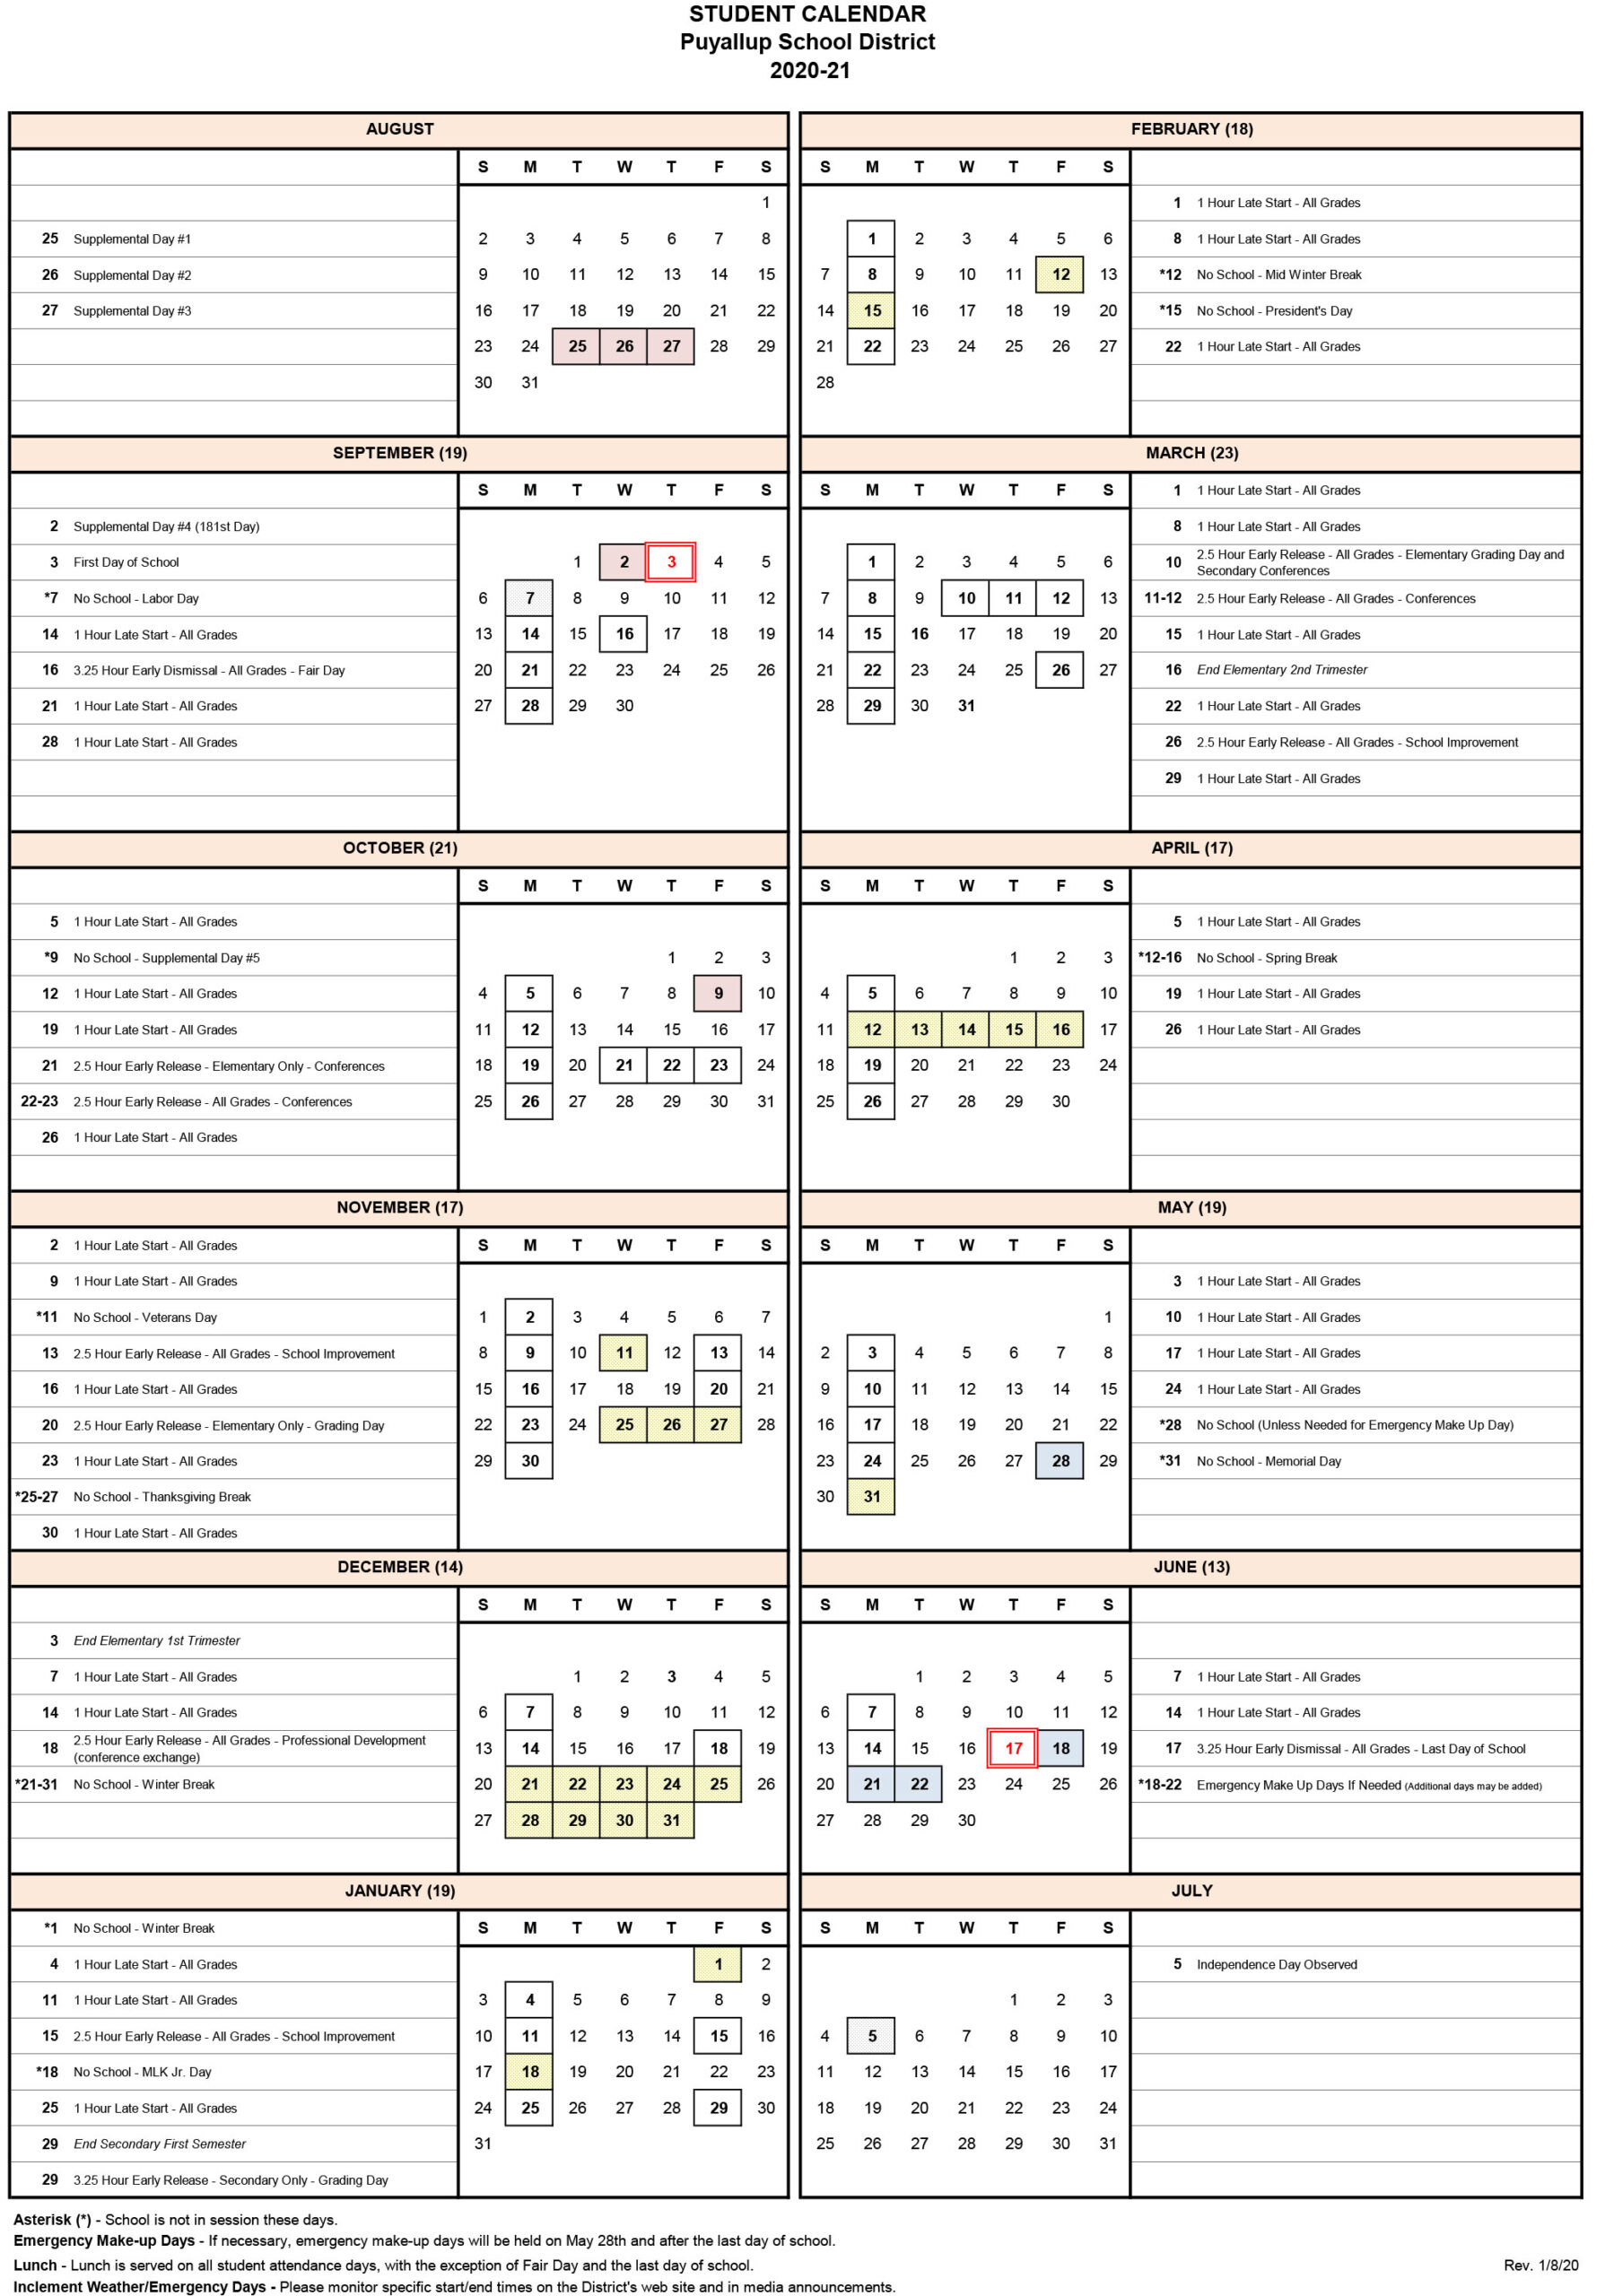 Wake Tech 2021 Calendar | Printable Calendar 2020-2021 intended for Nc Court Calendar Search By Name